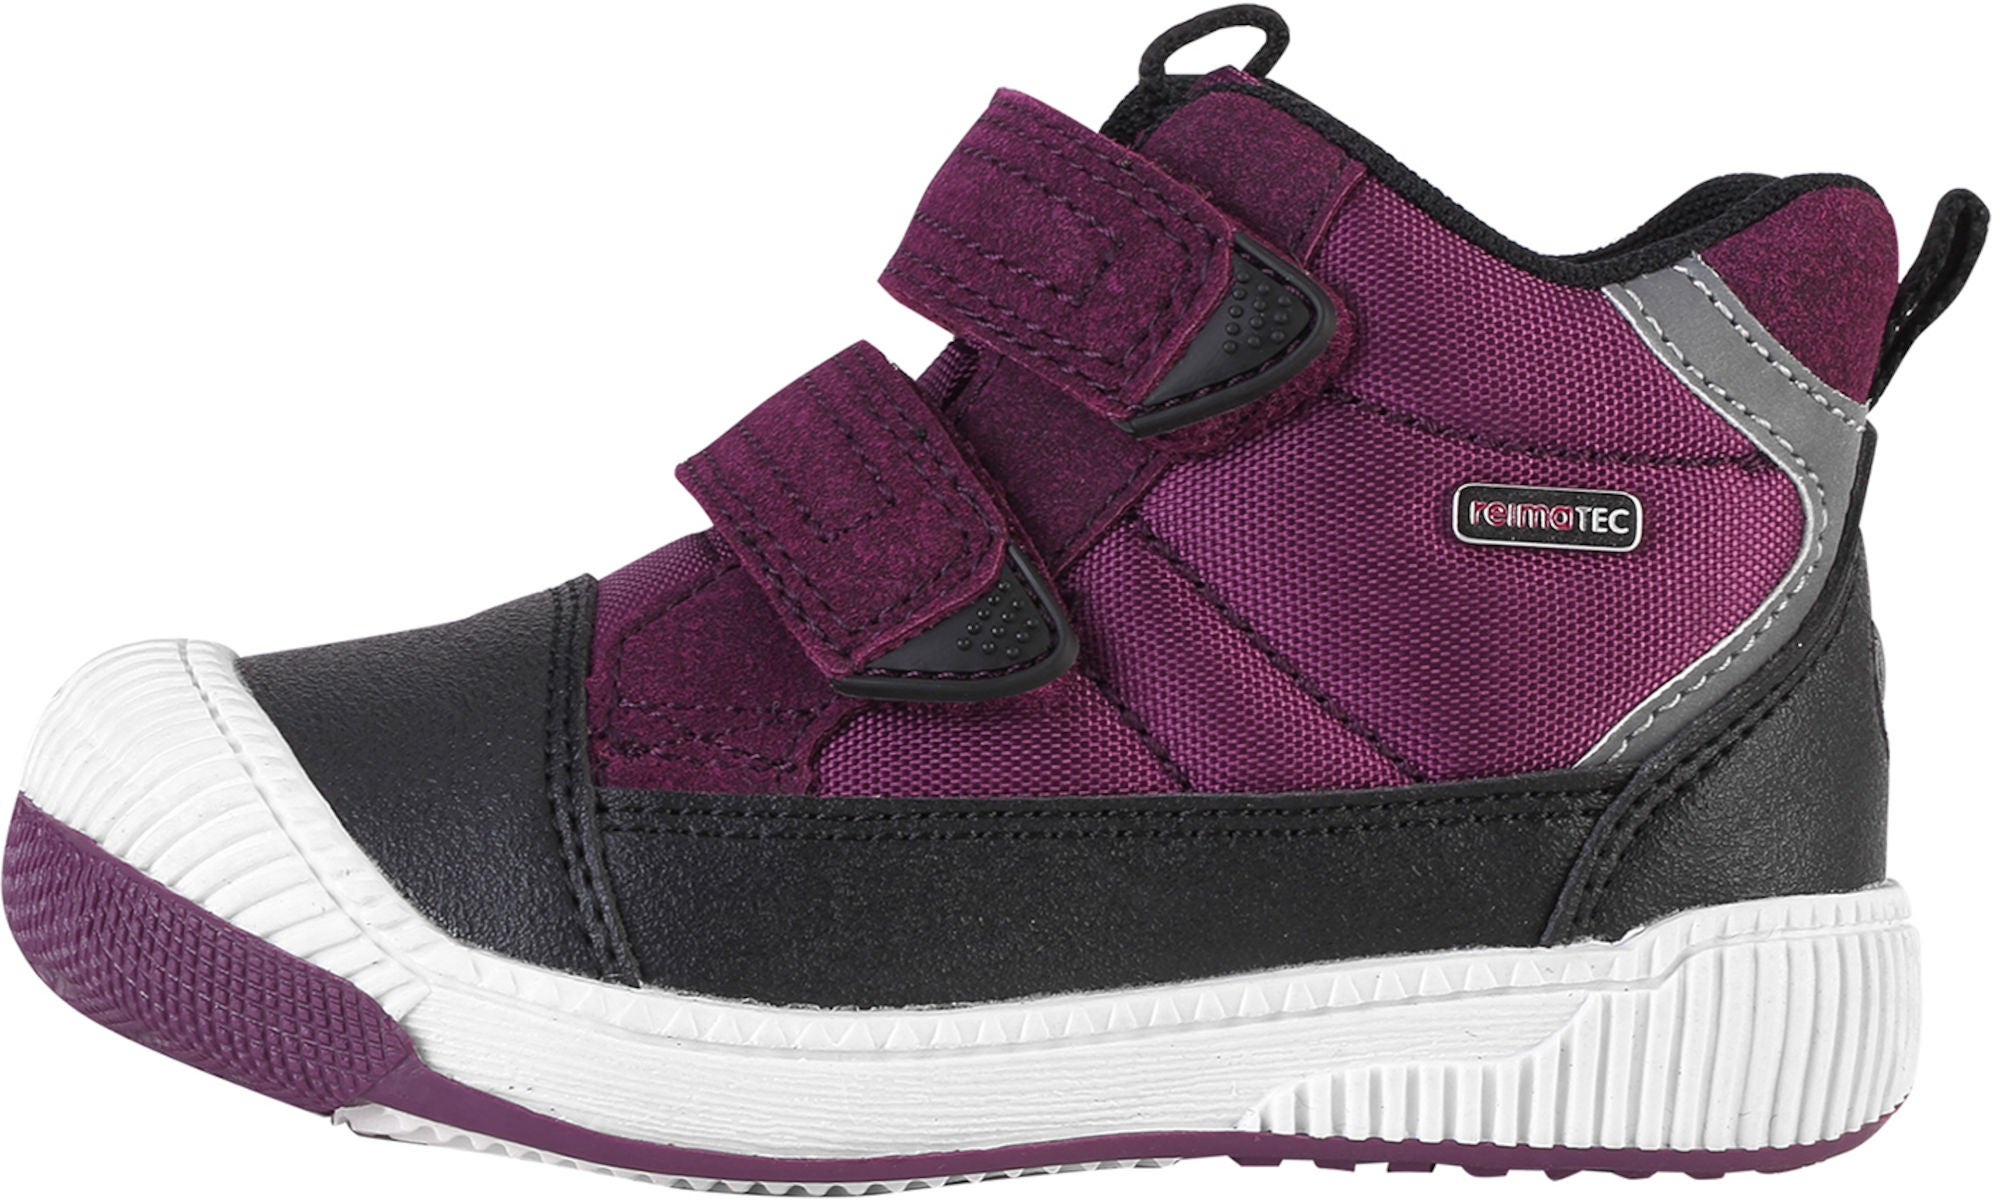 Vintersko & Boots   Stort utvalg for barn   Jollyroom